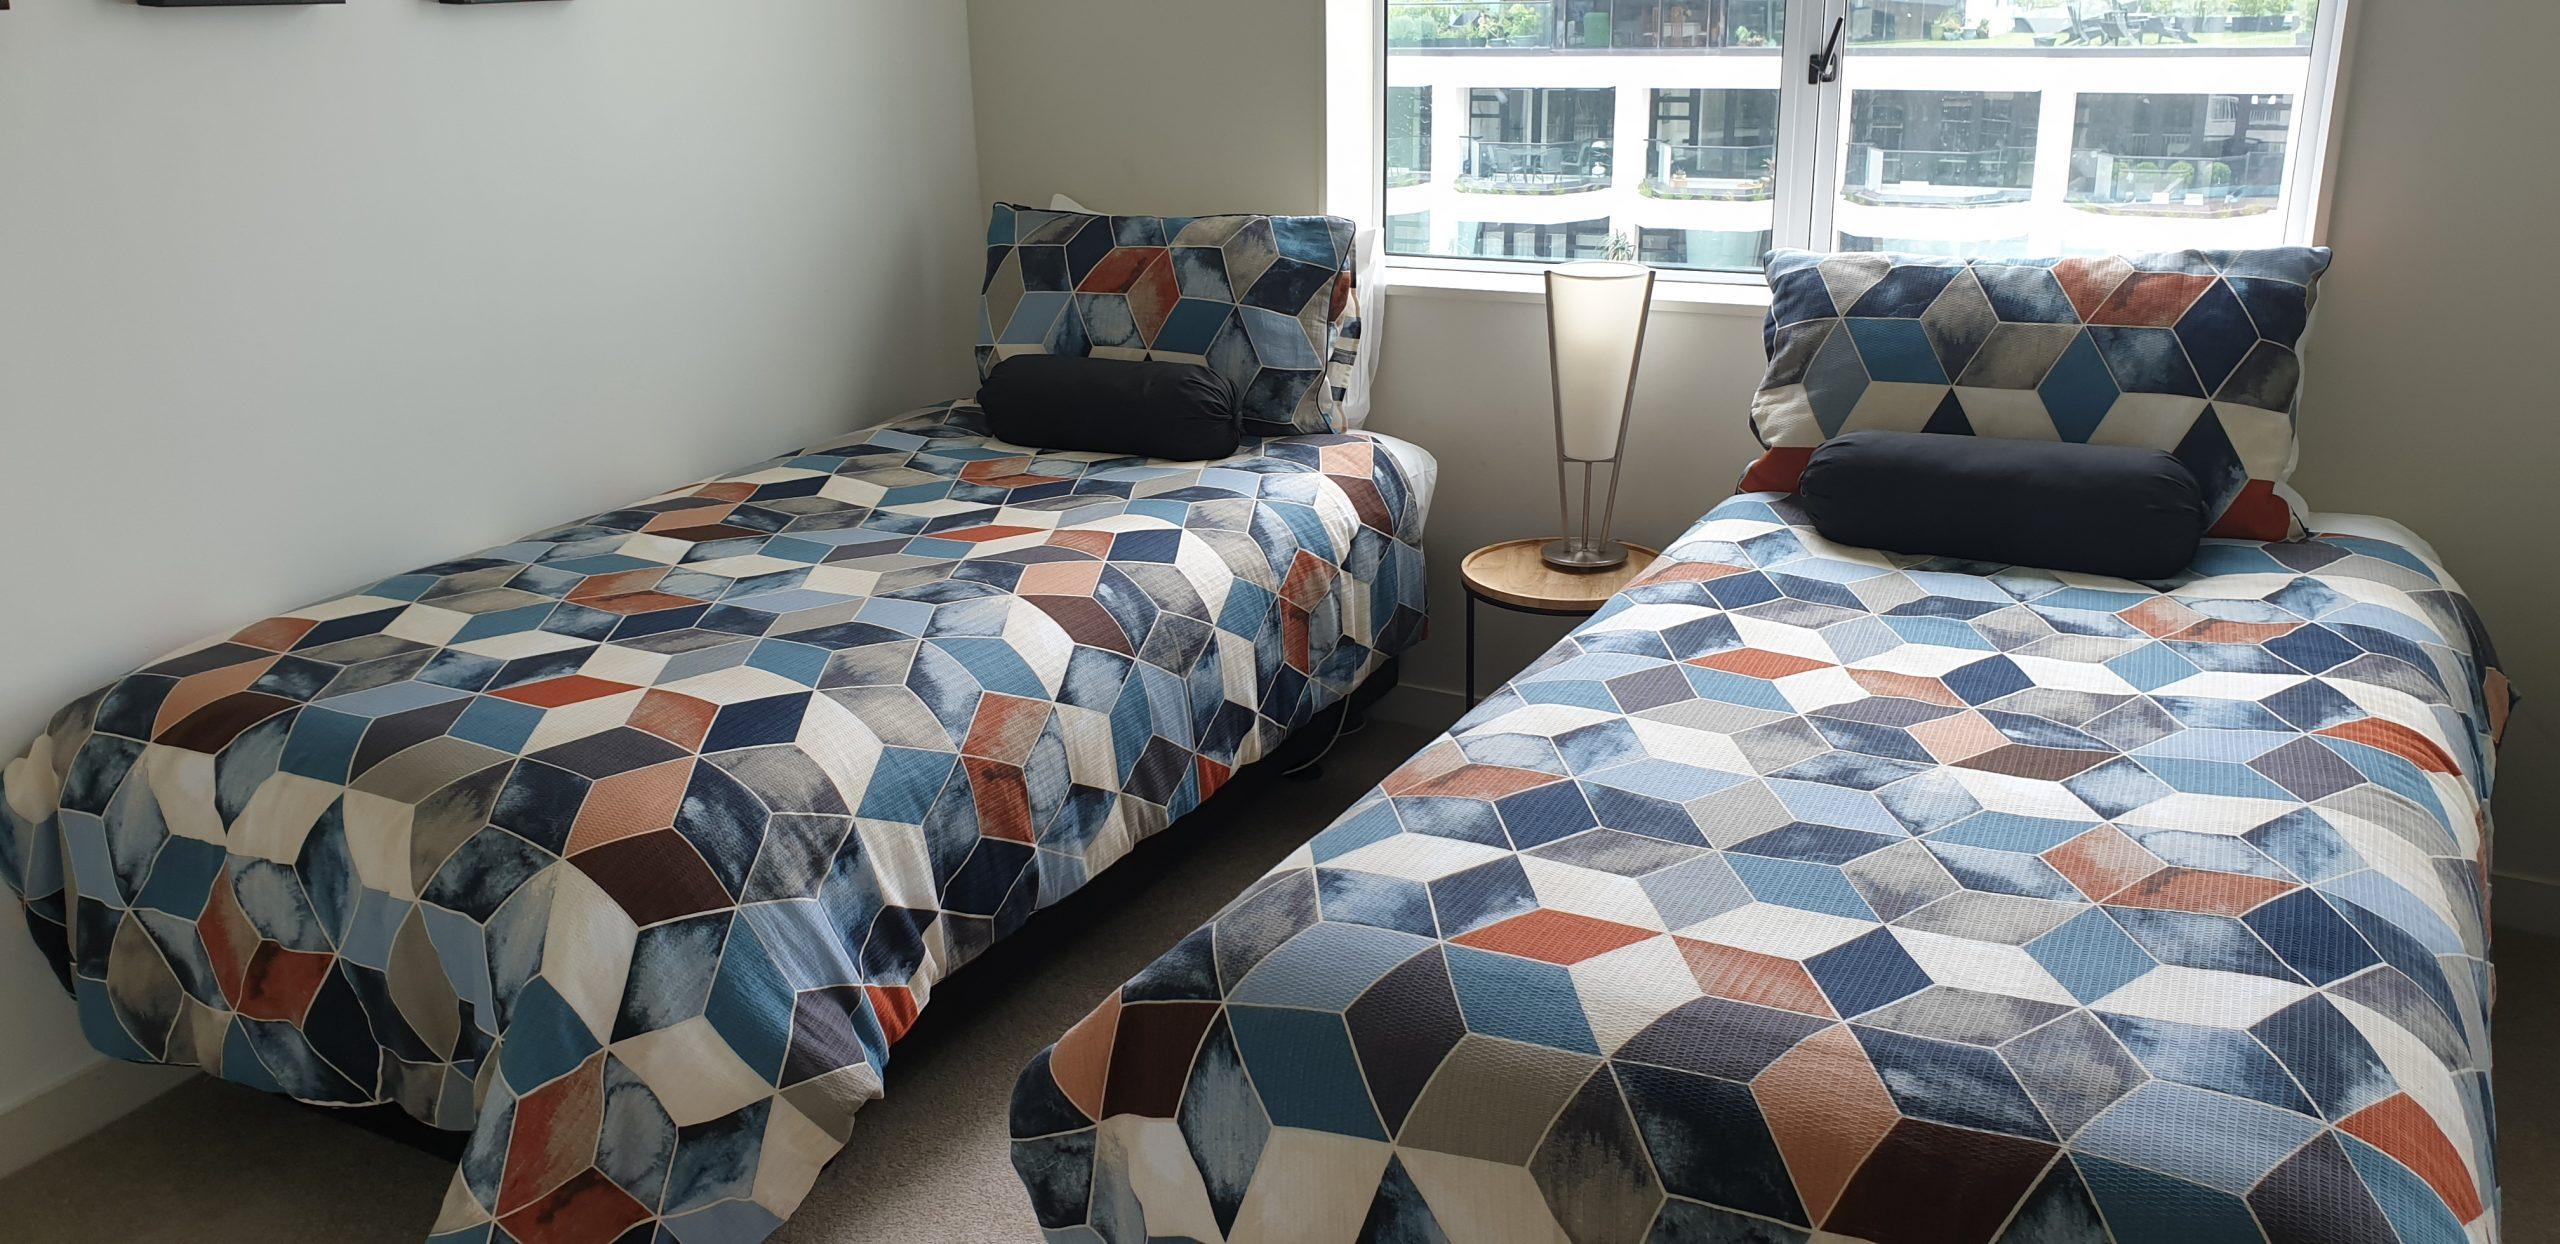 2 Bedroom 180° View Apartments (1 Queen Bed, 2 Single Beds)